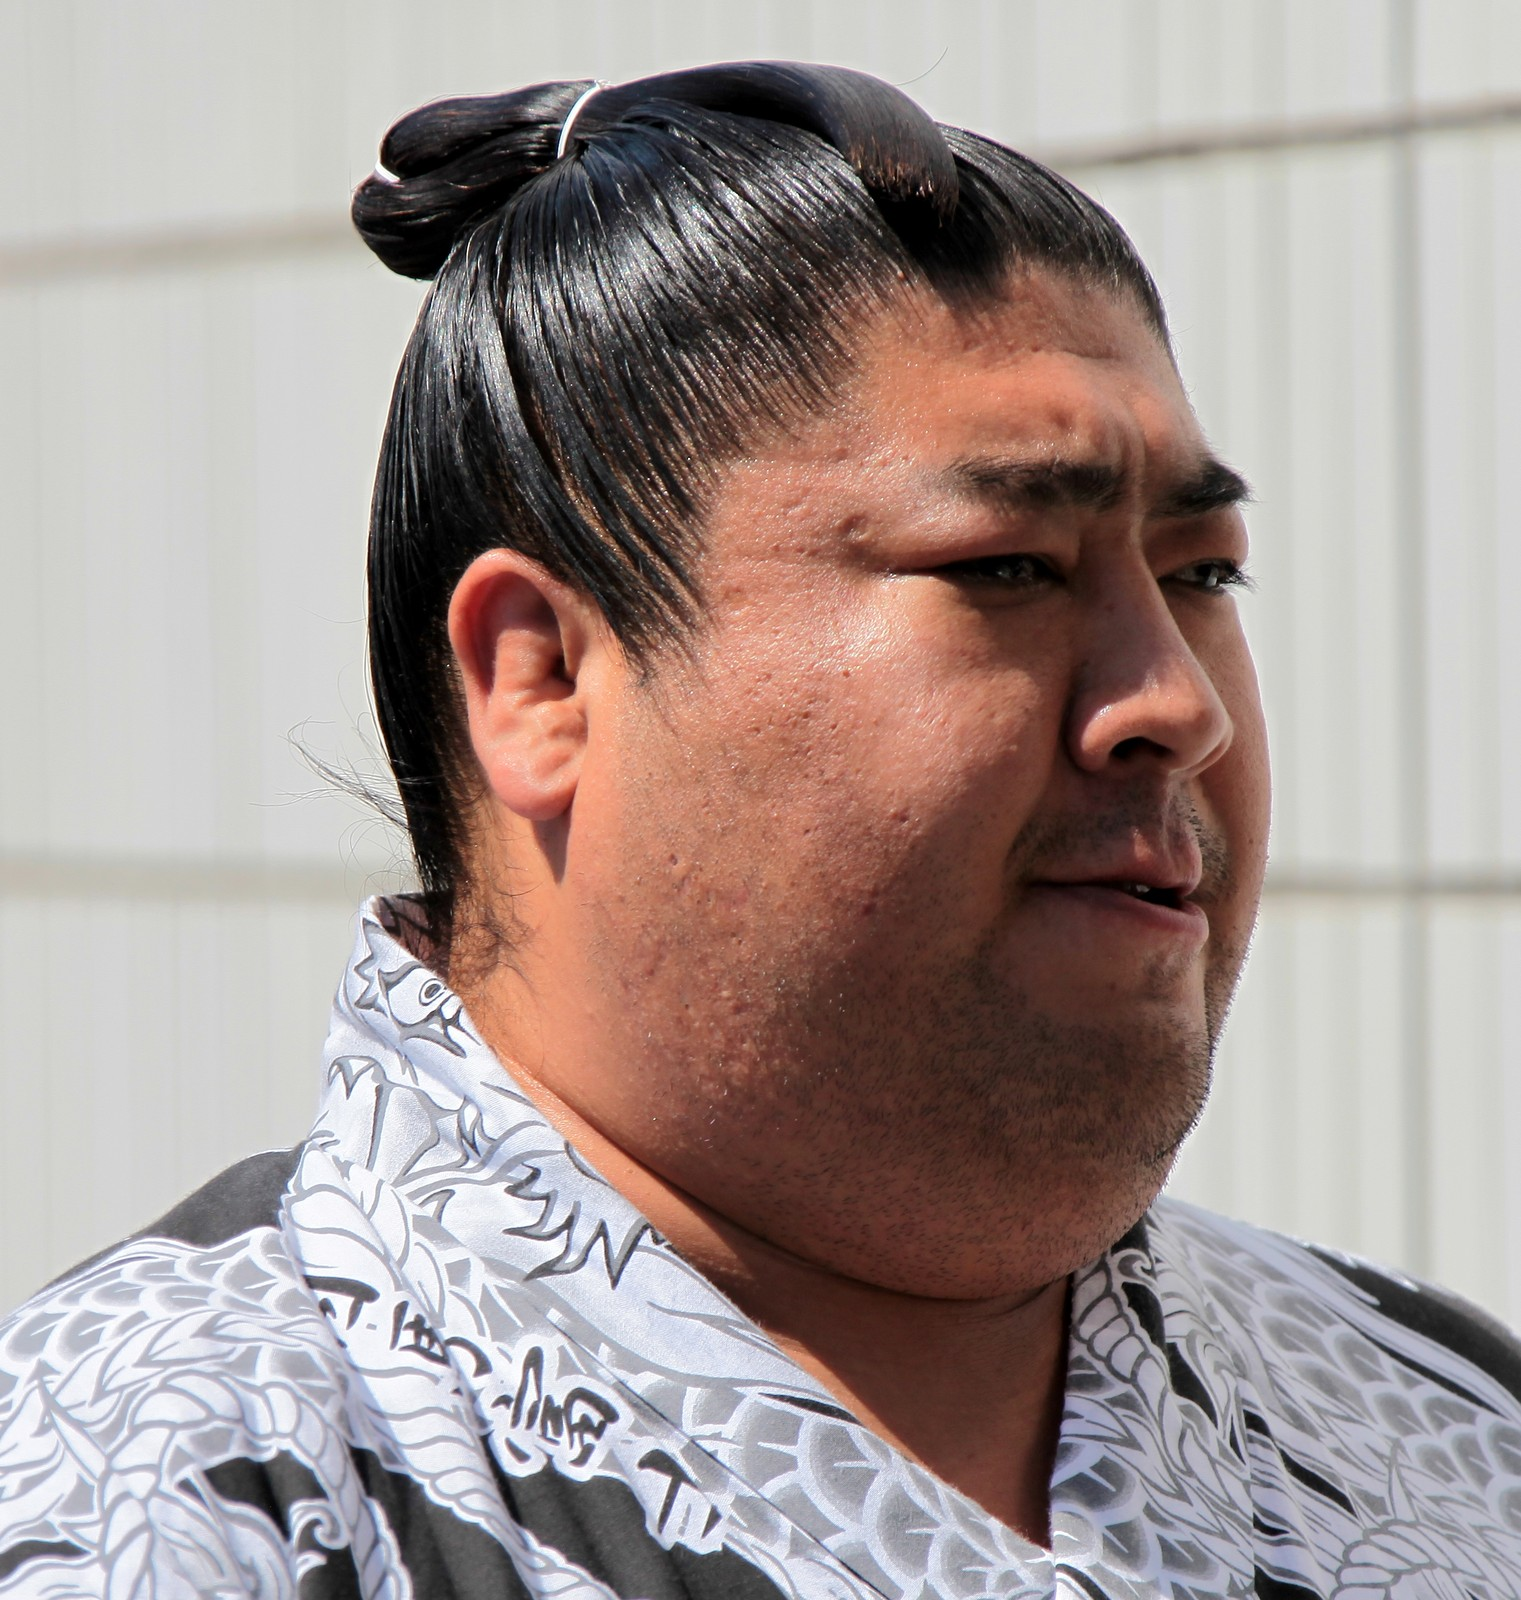 Coiffure sumo rikishi 力士 chon mage chignon Tokyo Japon